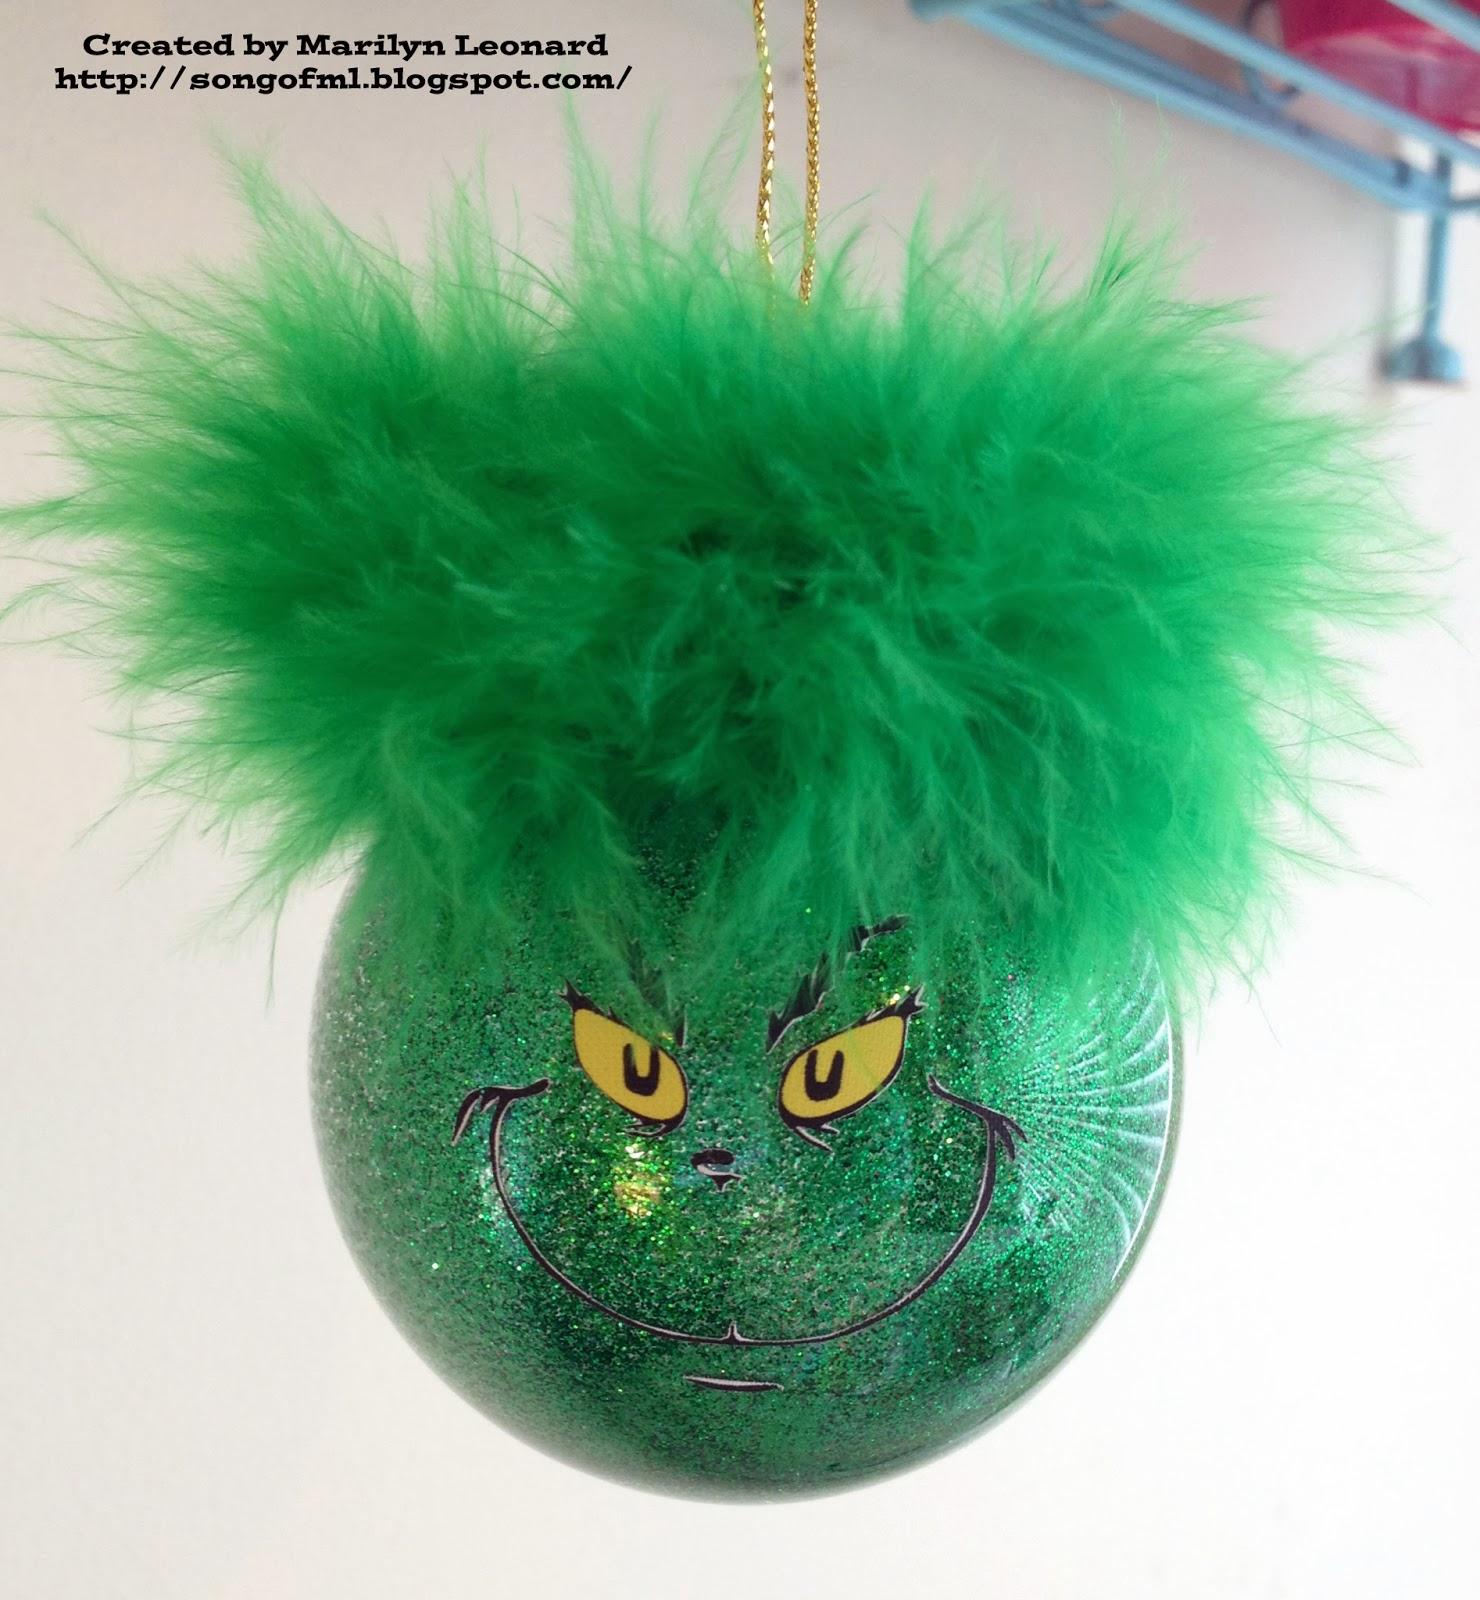 Marilyn S Crafts Grinch Ornament